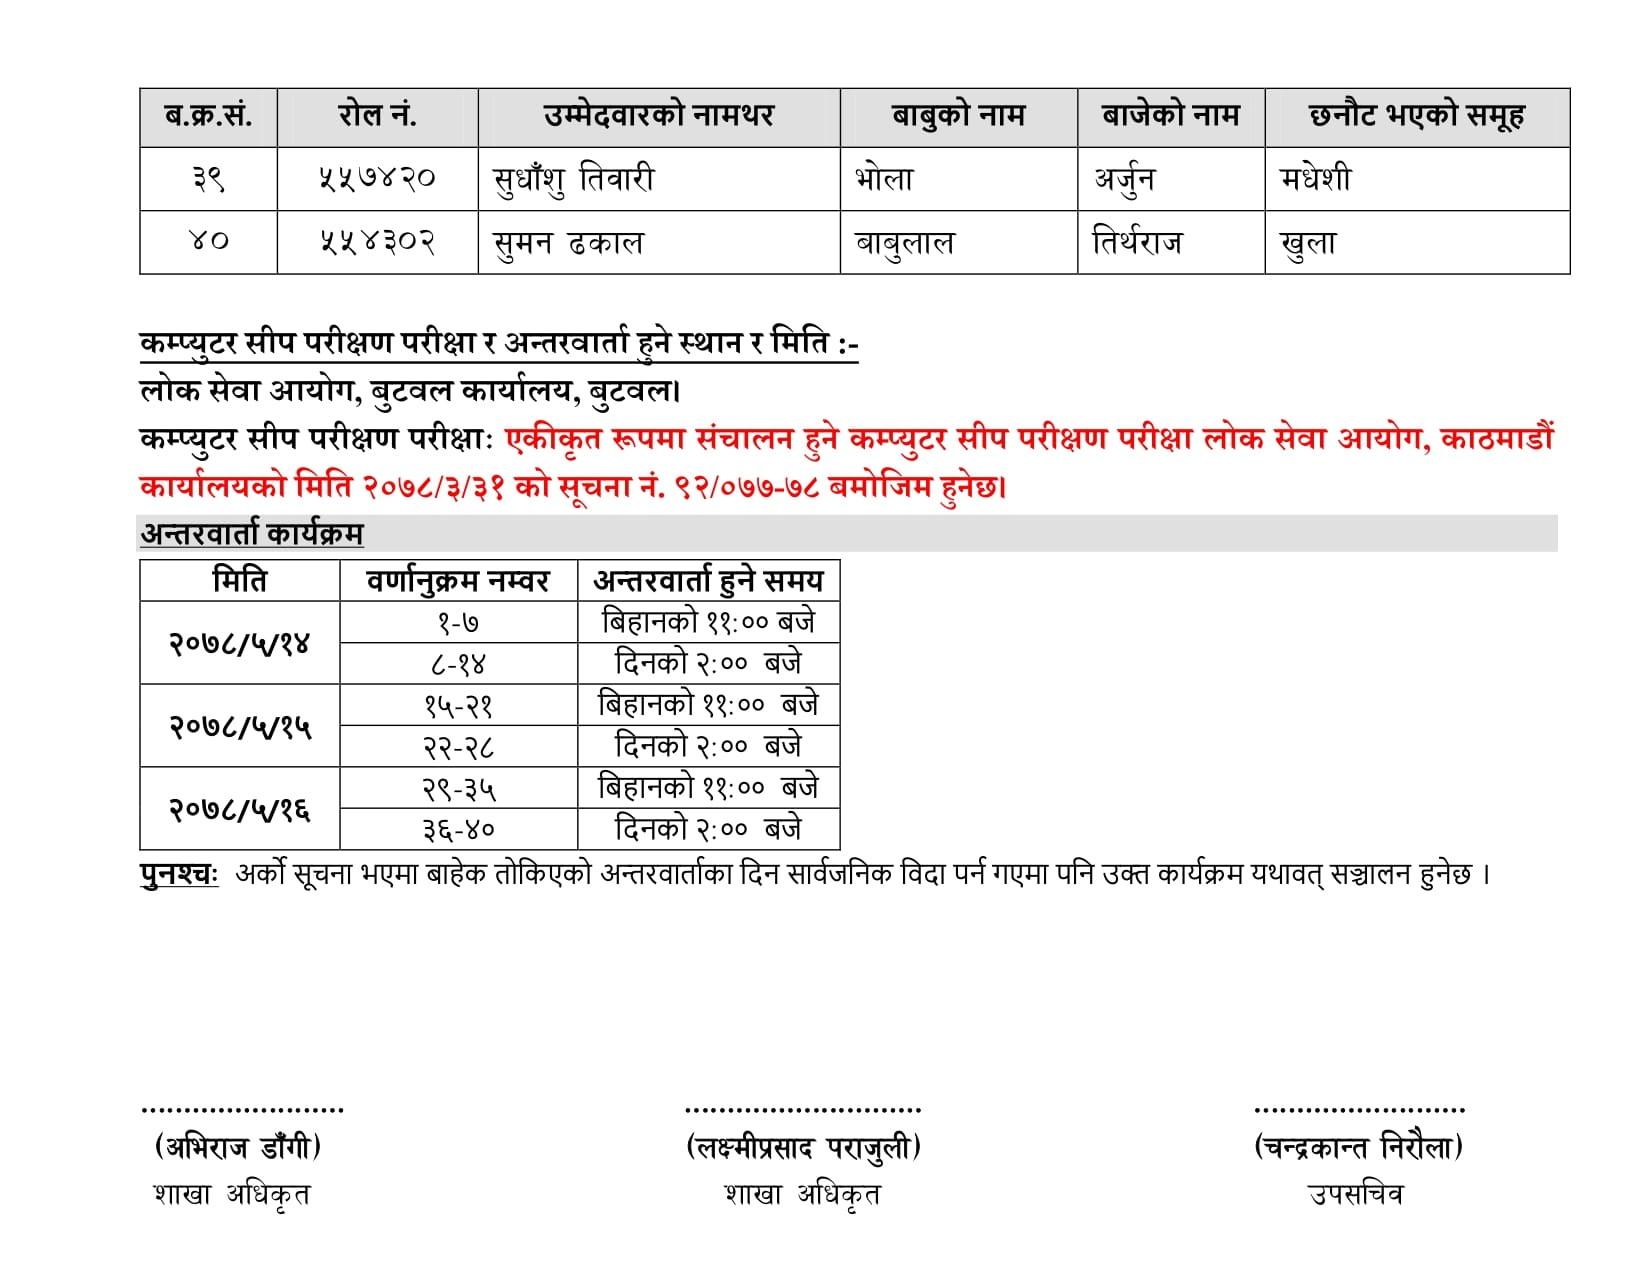 NASU Justice, Law and Public Prosecutor  - Butwal Lok Sewa Aayog Written Exam Result & Exam Schedule